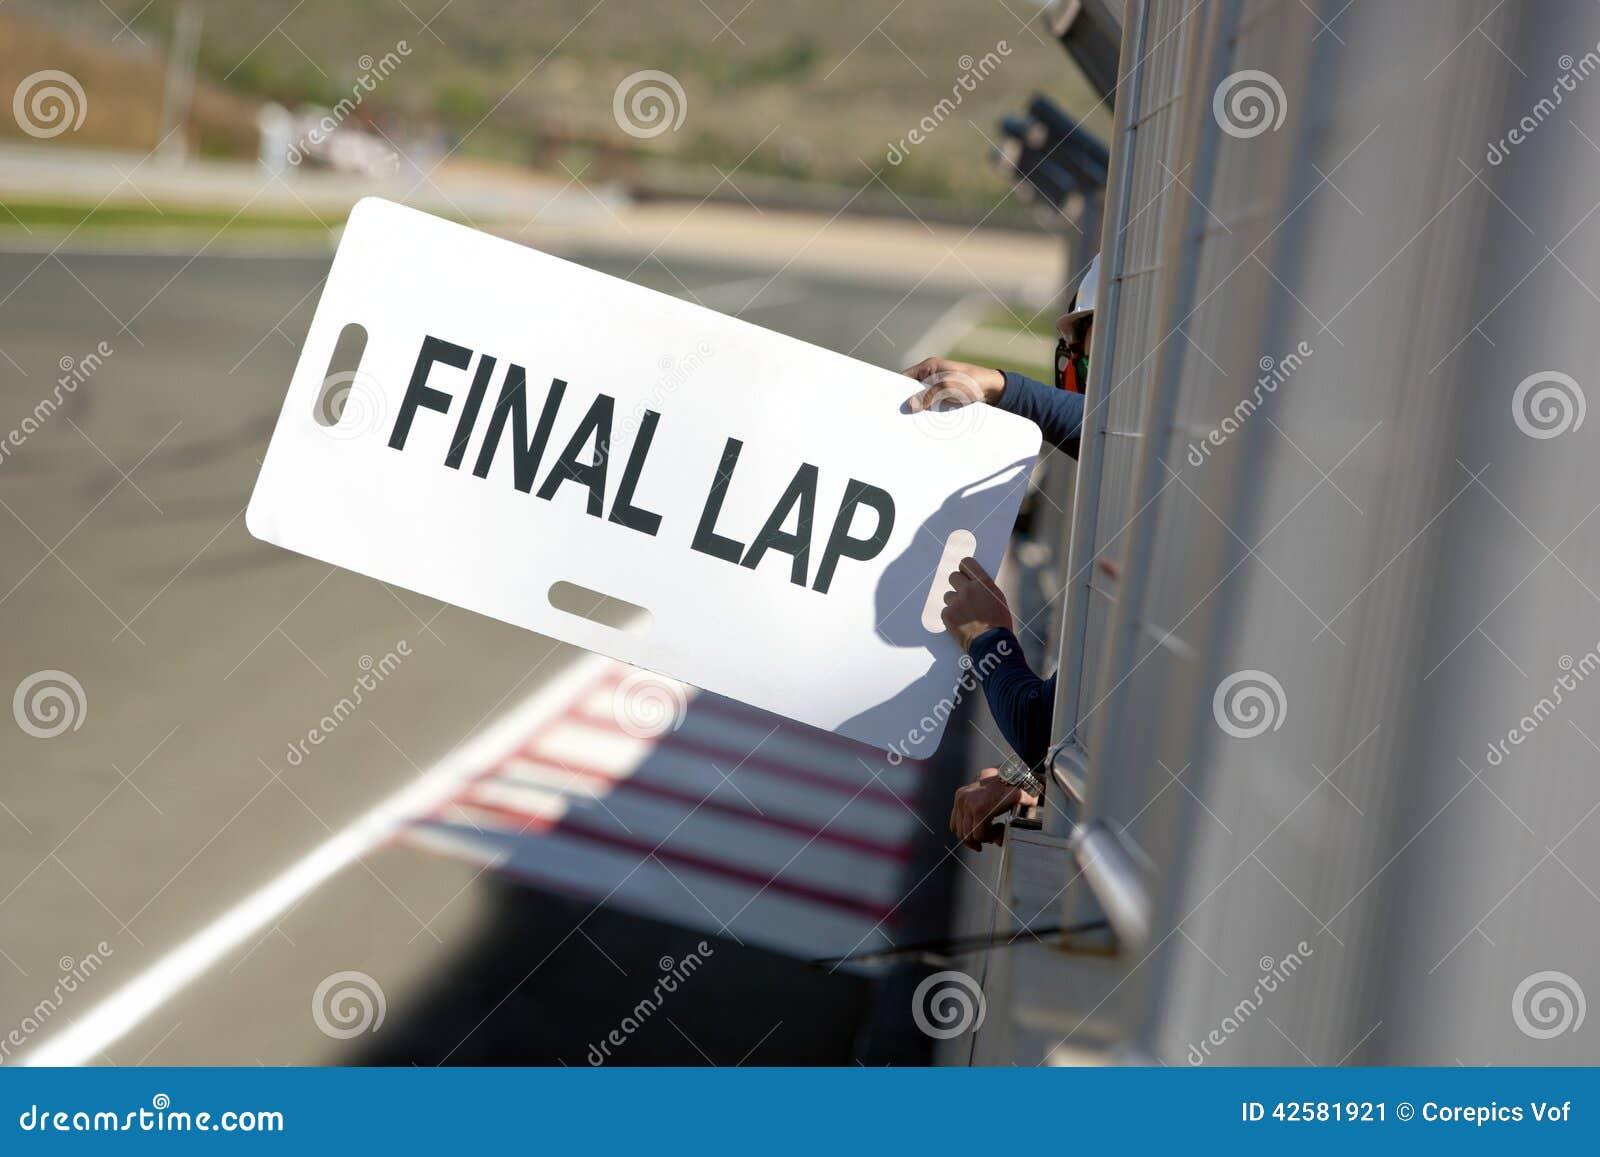 final lap stock image  image of laptime  stones  winning